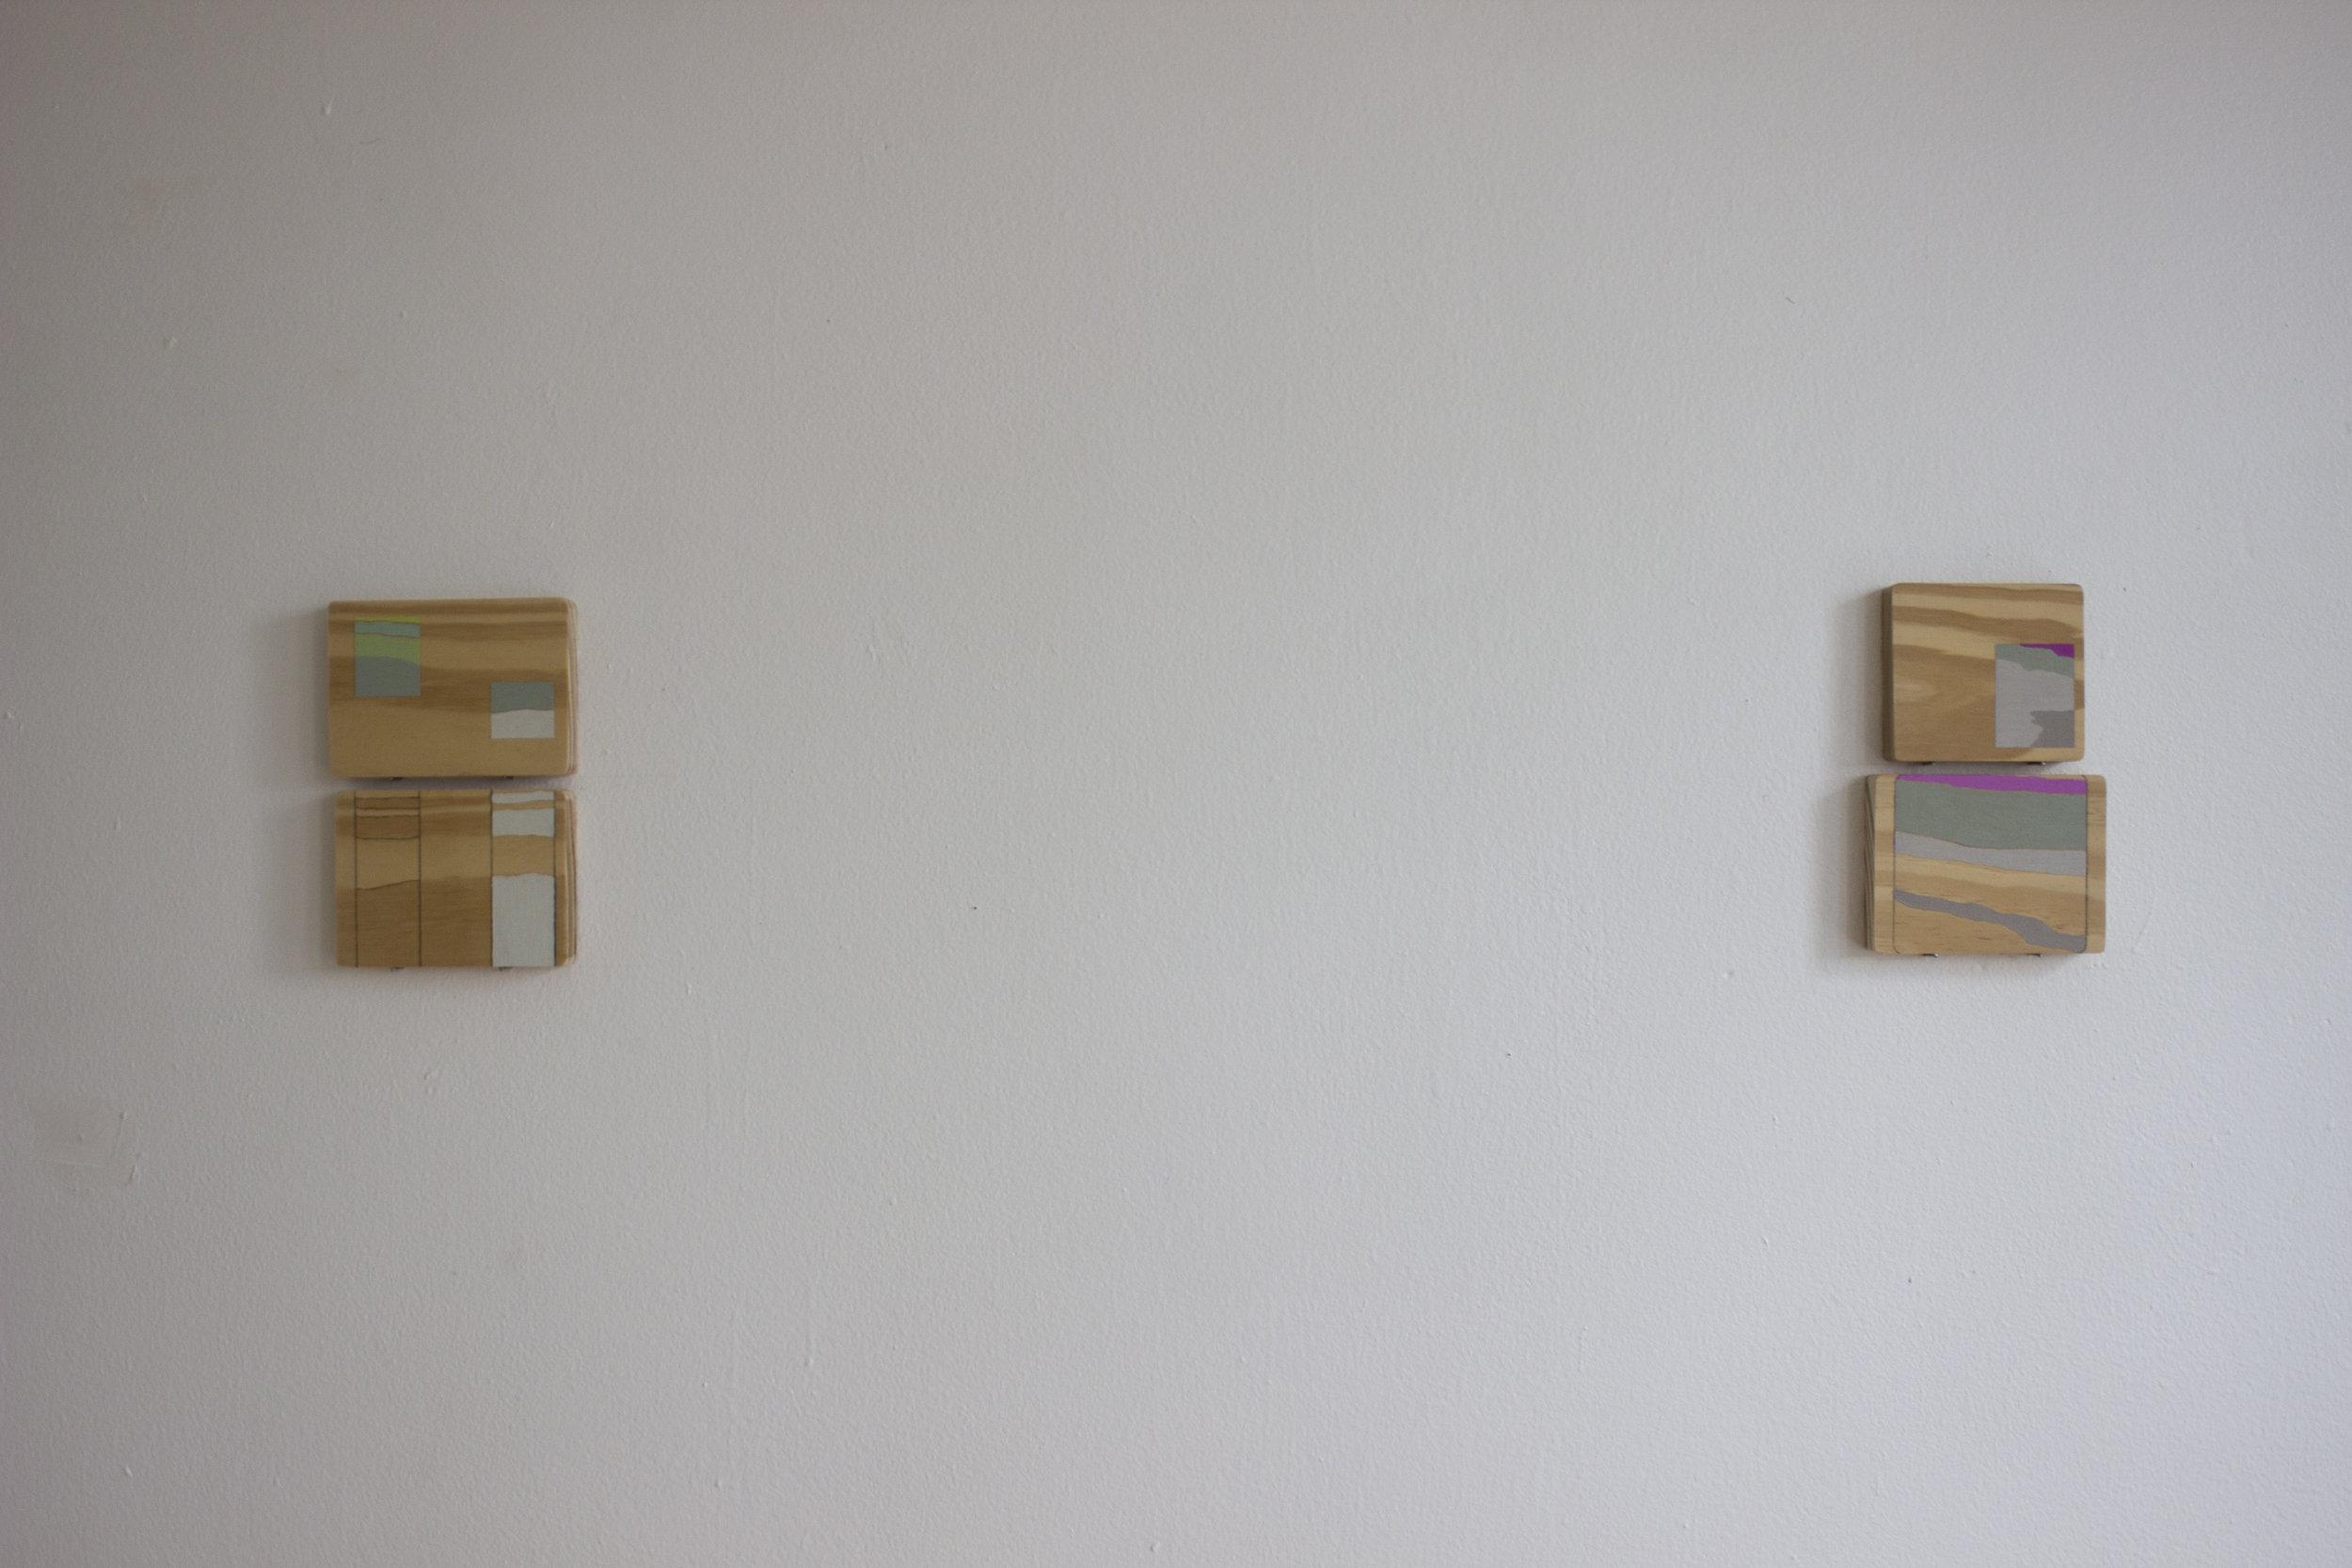 Installation view at Apparatus